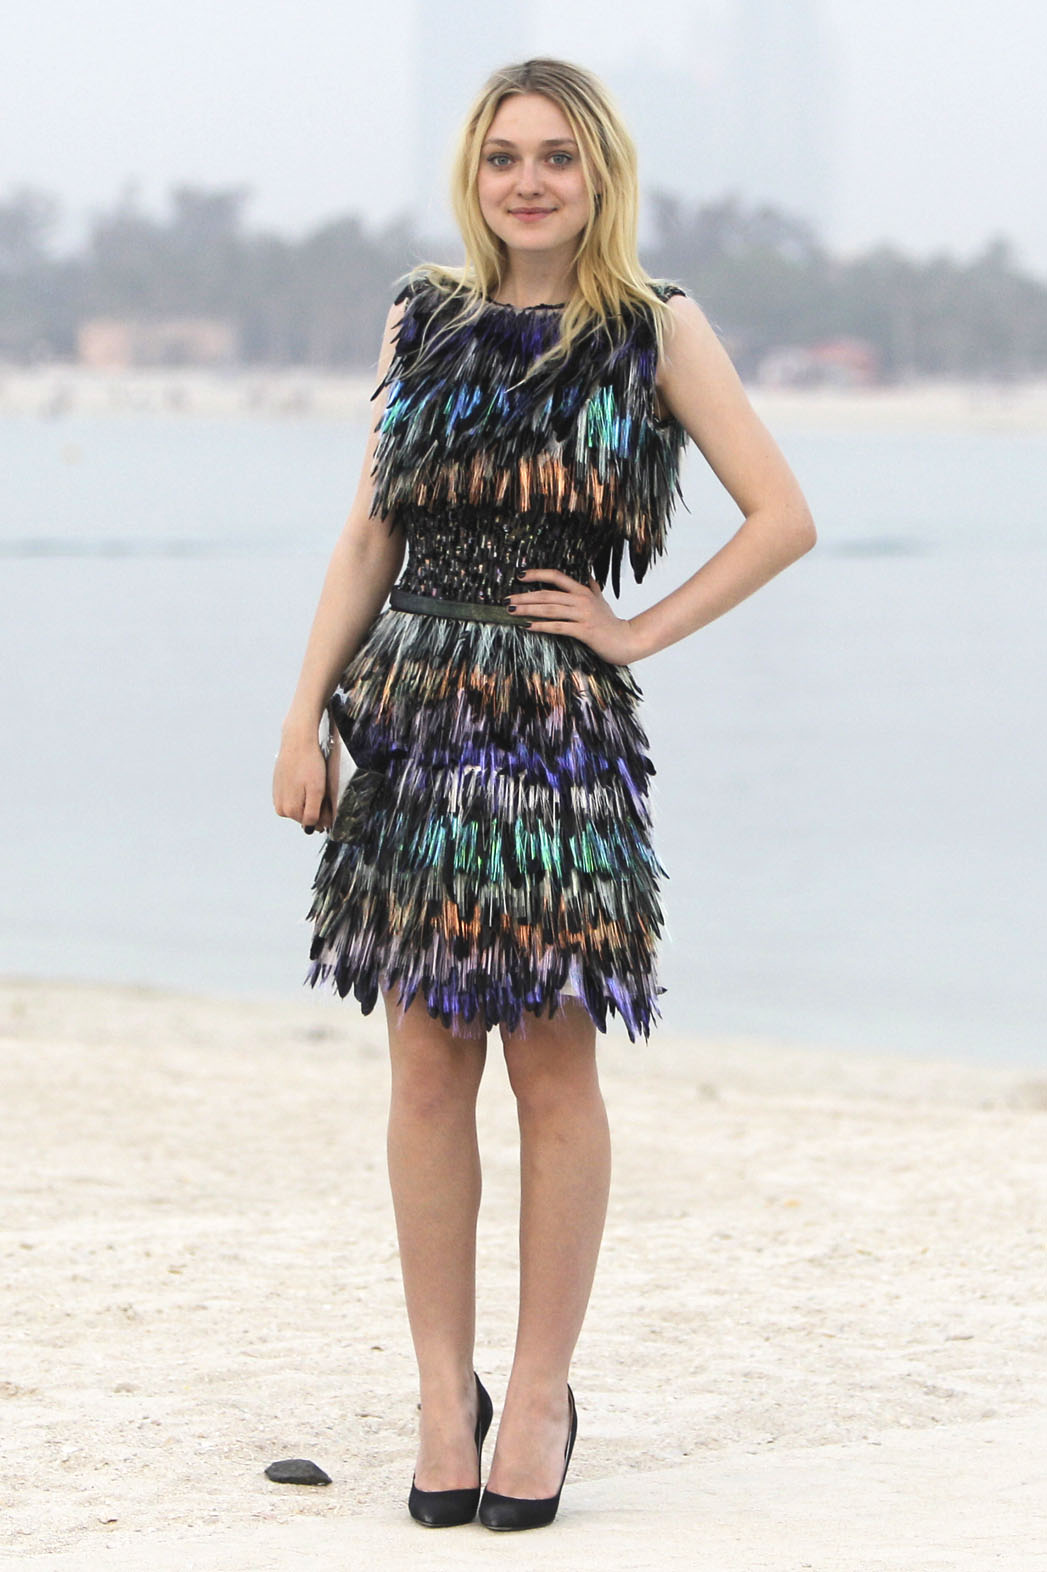 Dakota Fanning Chanel Cruise - P 2014